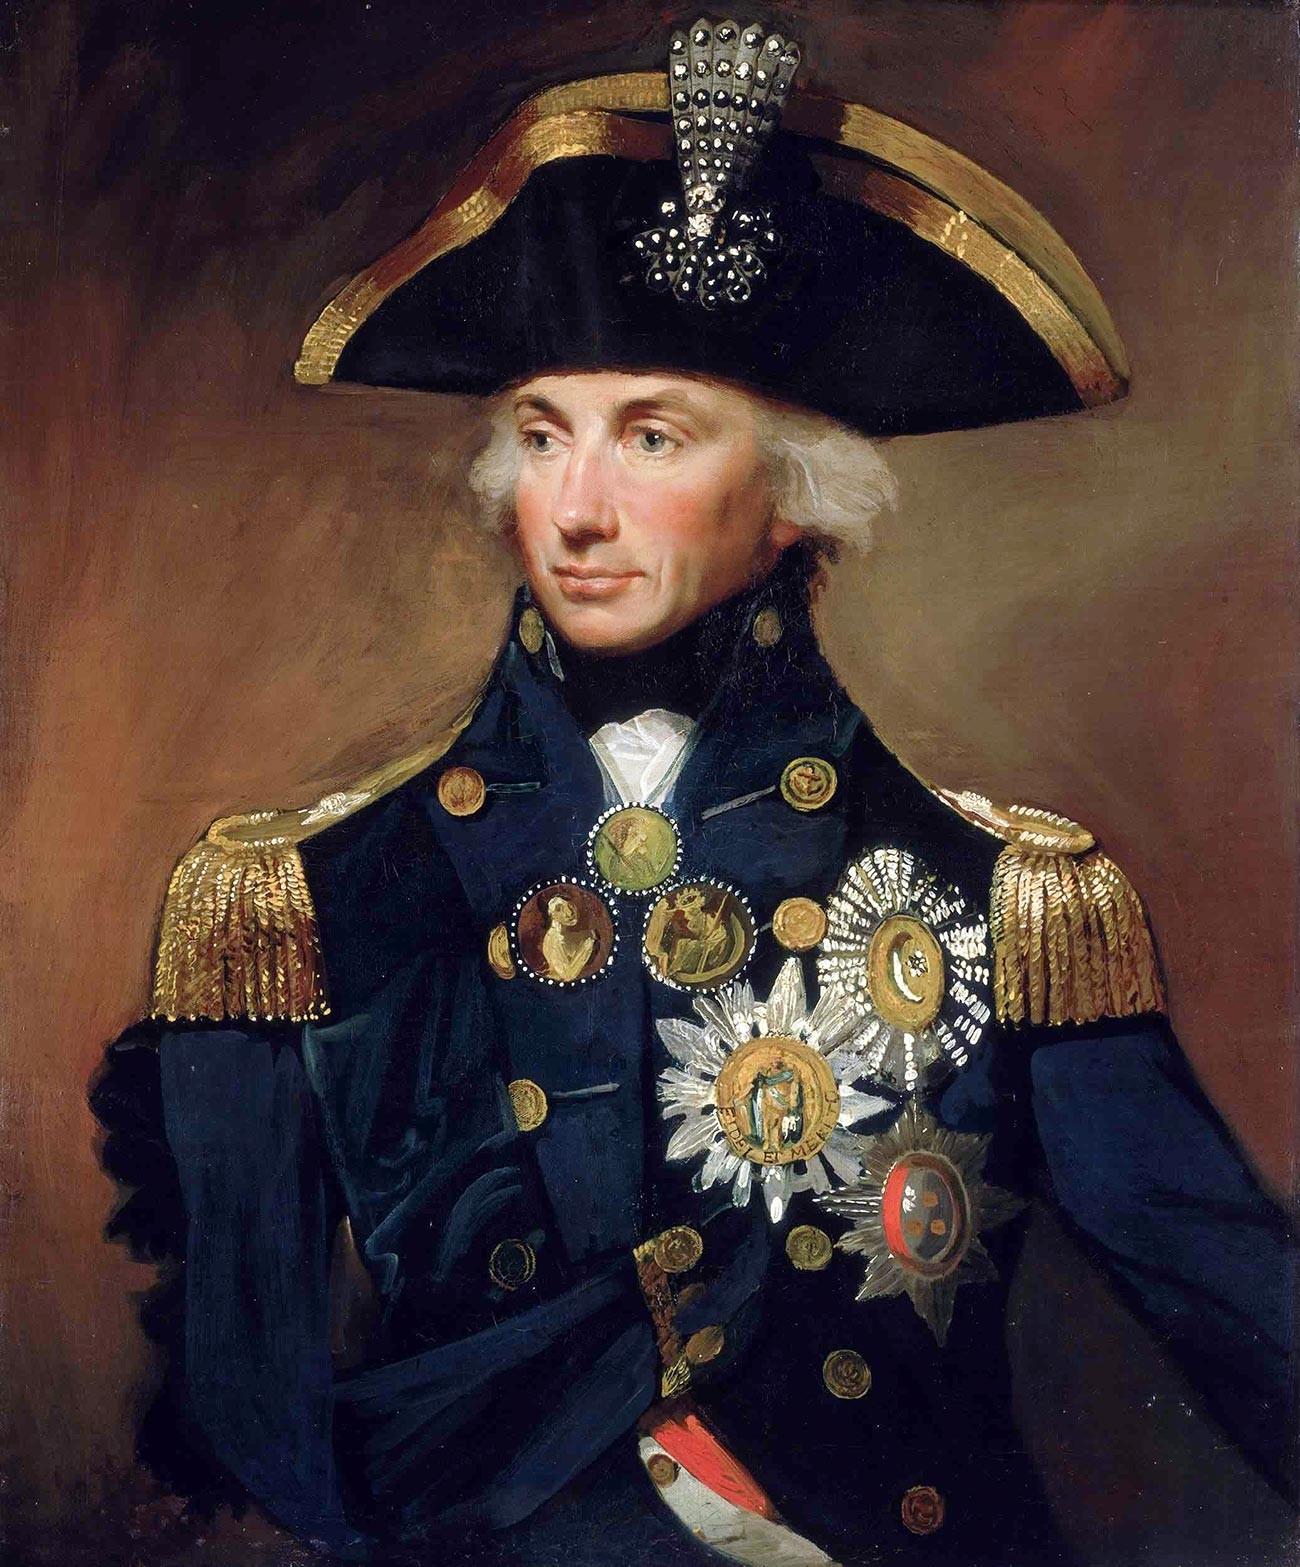 Вице-адмирал Горацио Нельсон.